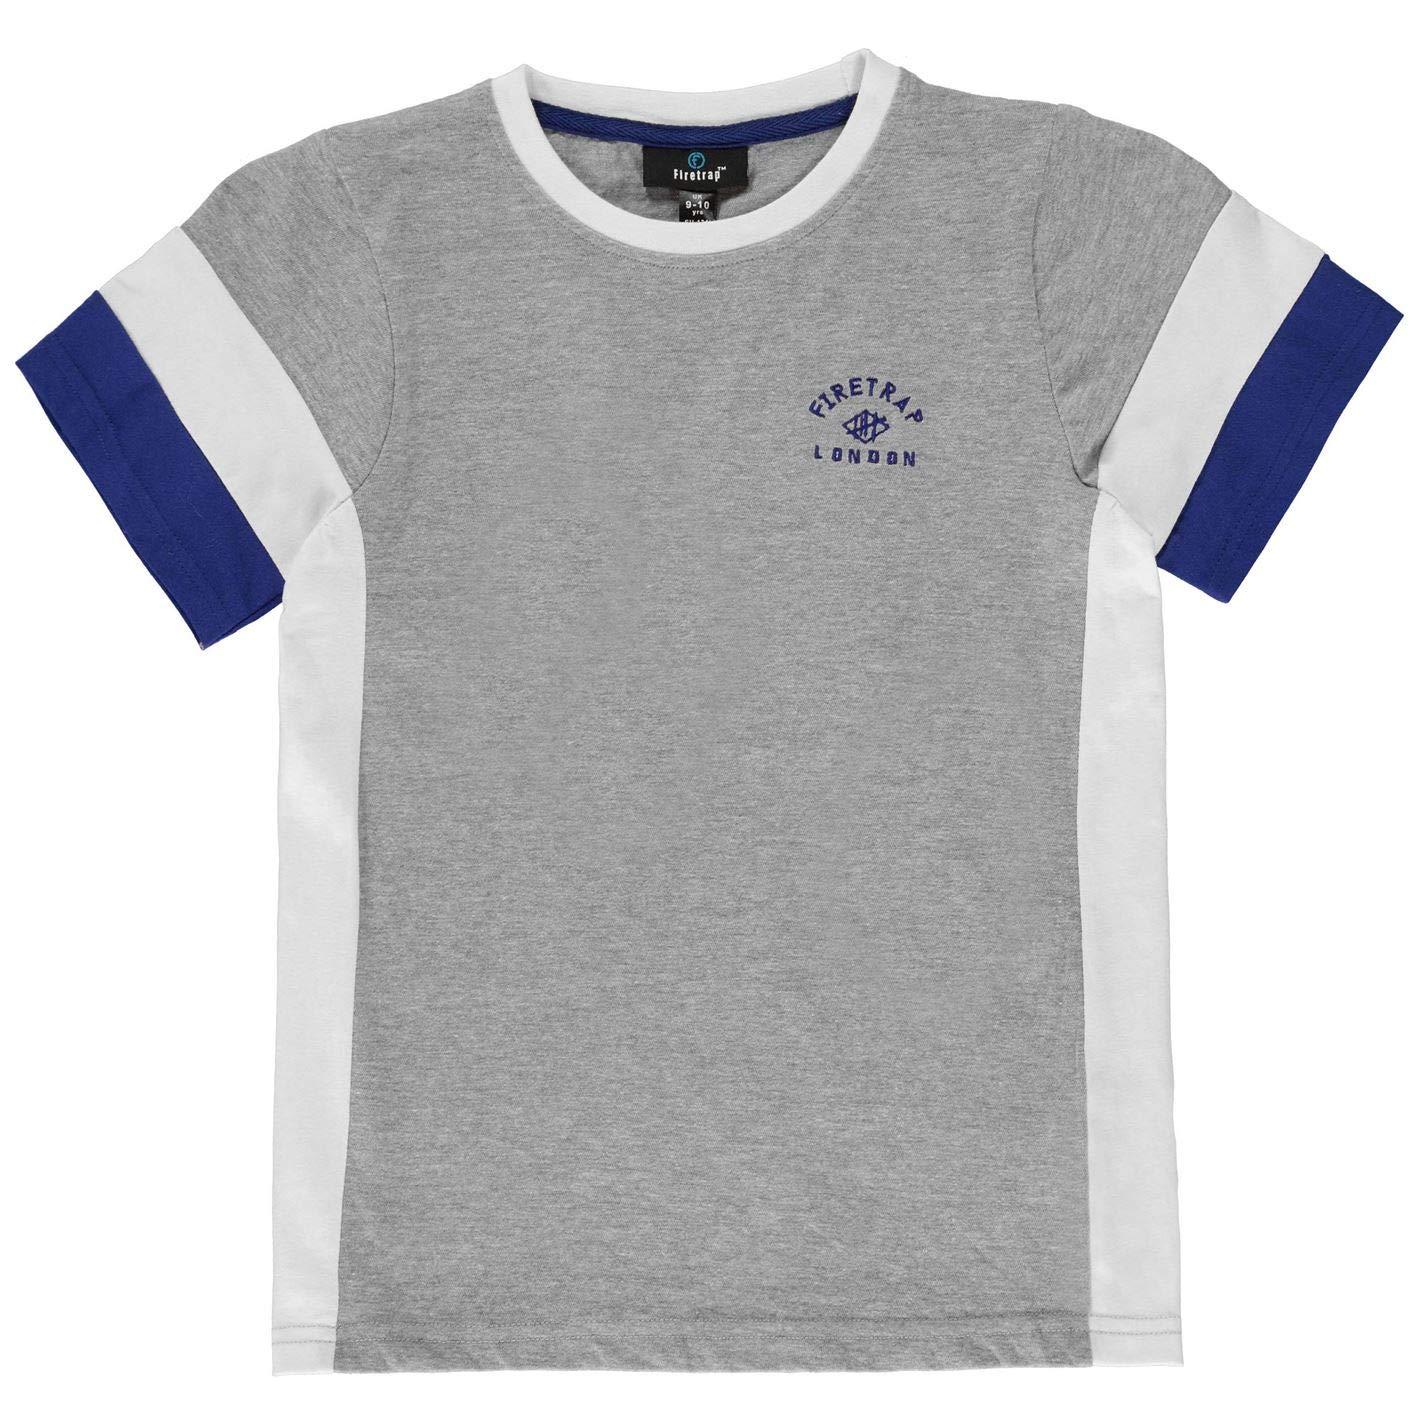 Firetrap Kids Boys Sub T Shirt Junior Crew Neck Tee Top